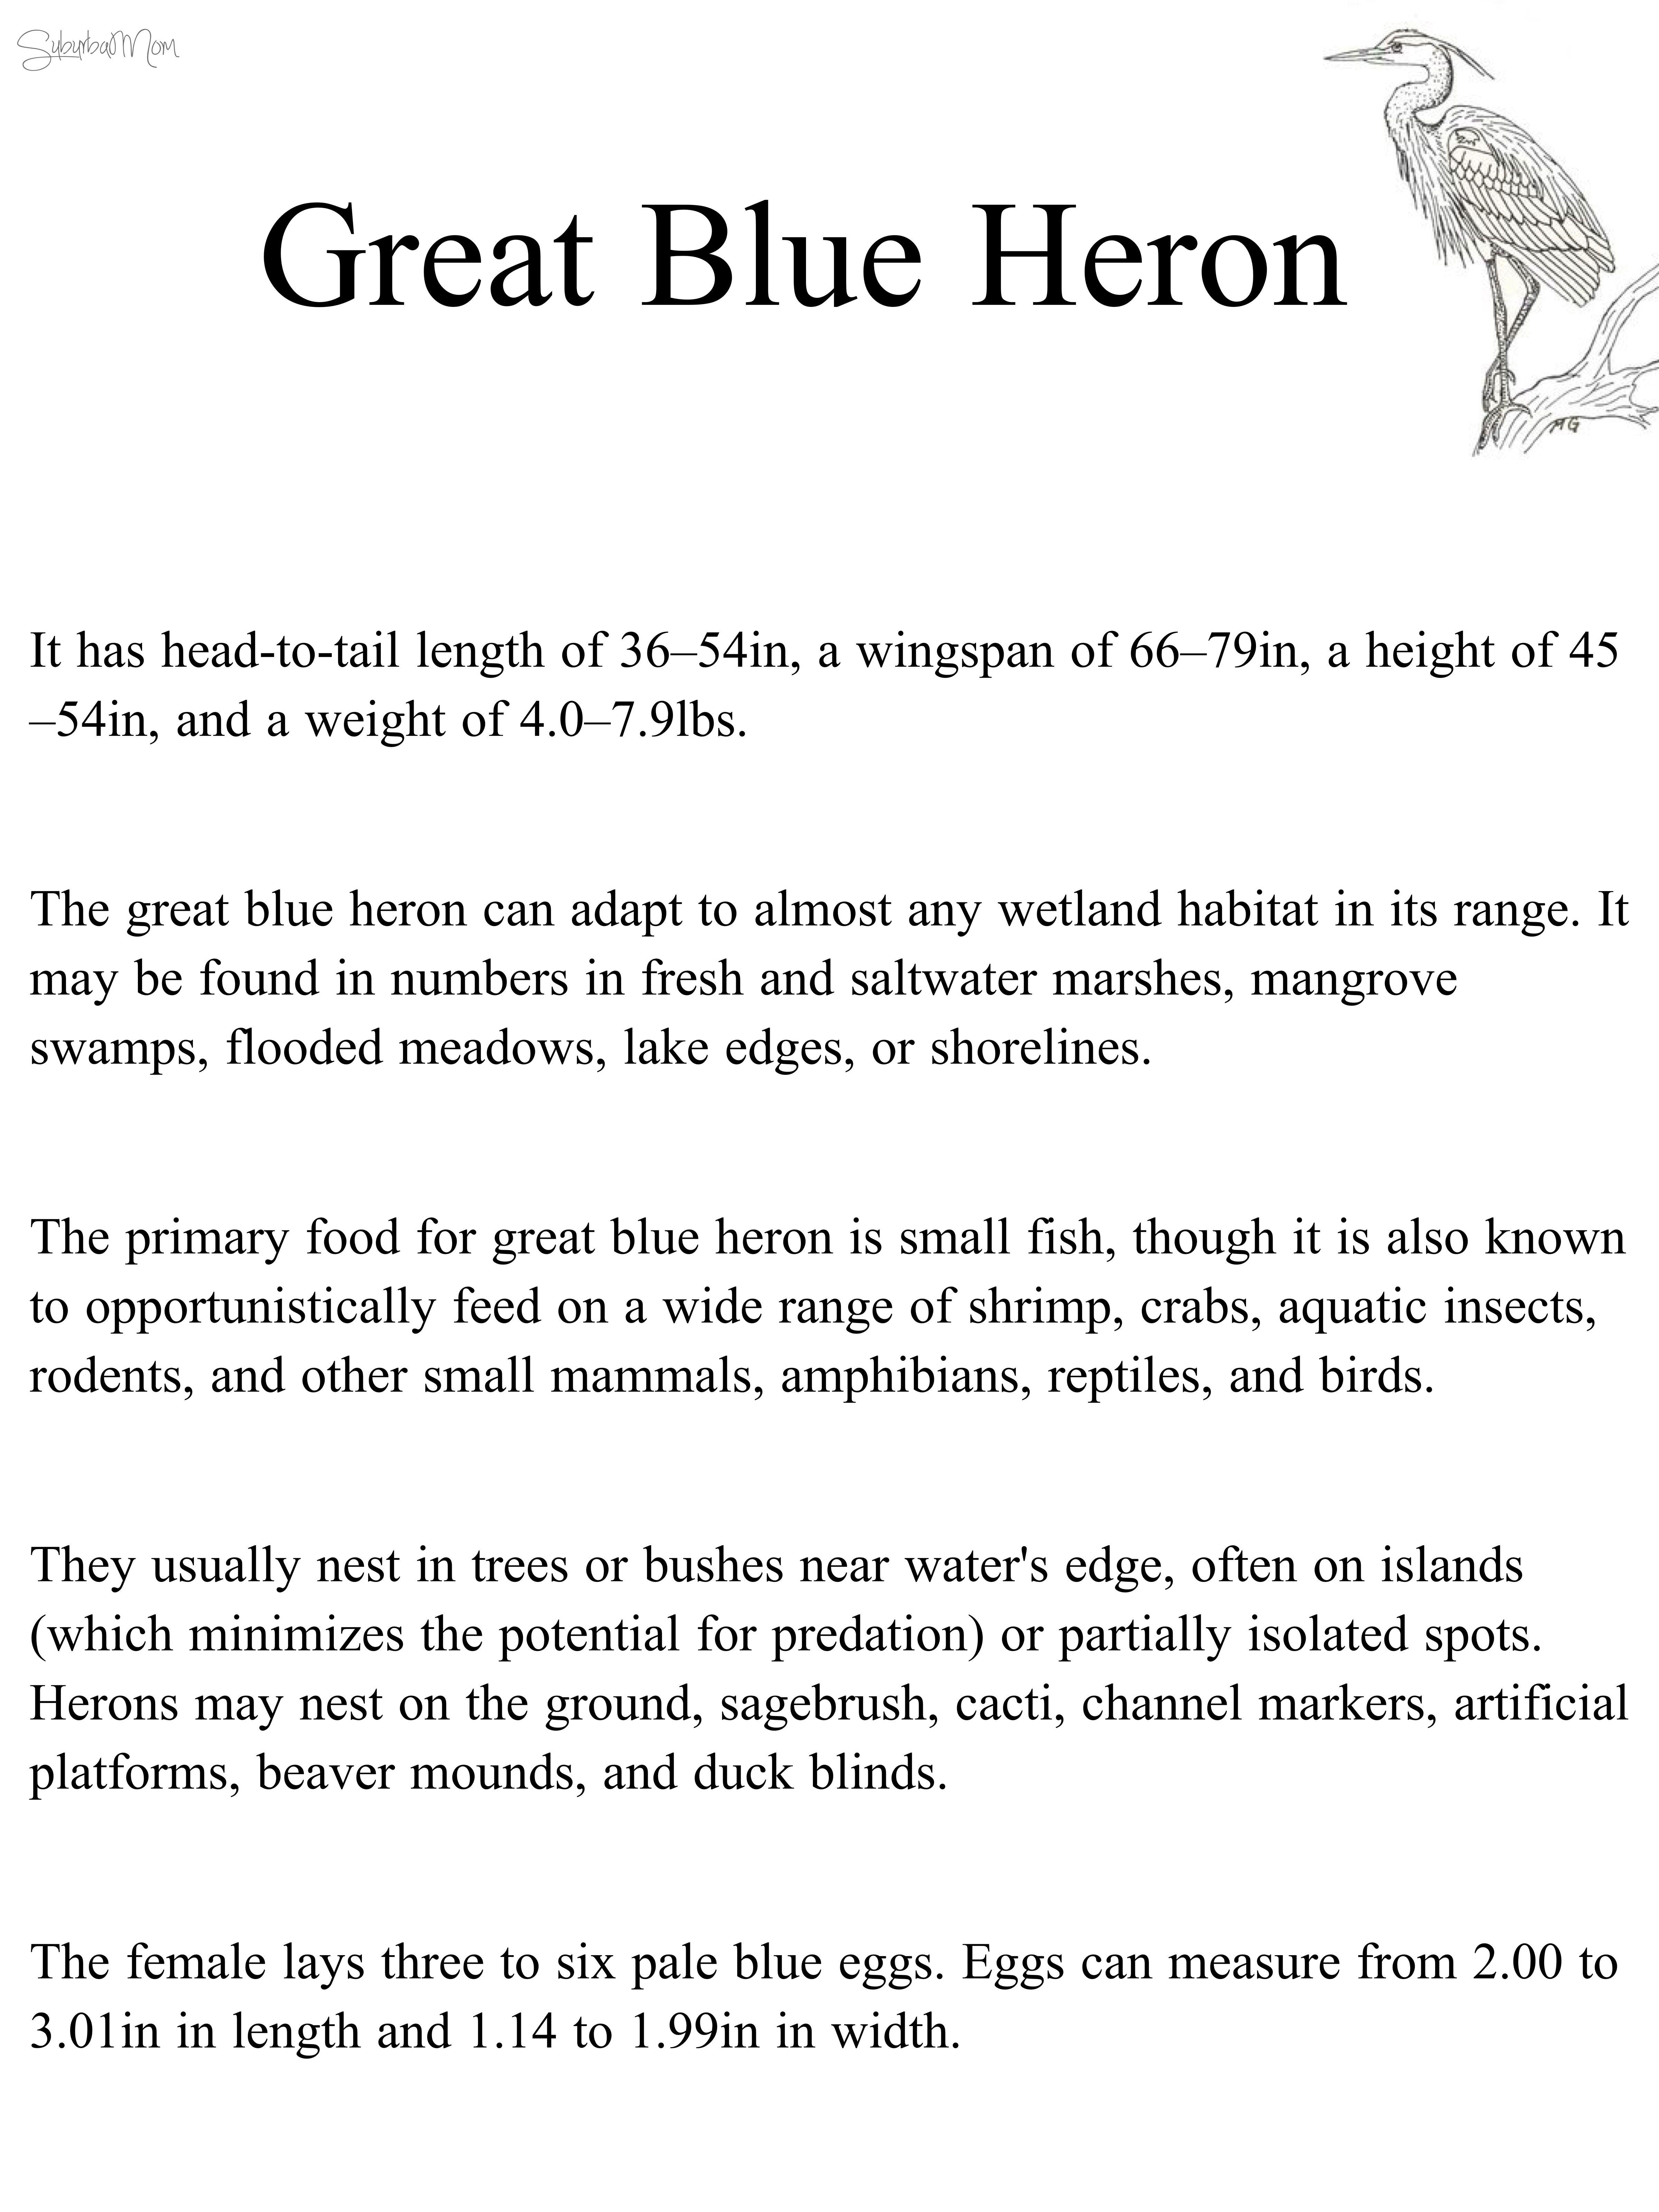 blue heron, great blue heron, habitat, science, natural science ...